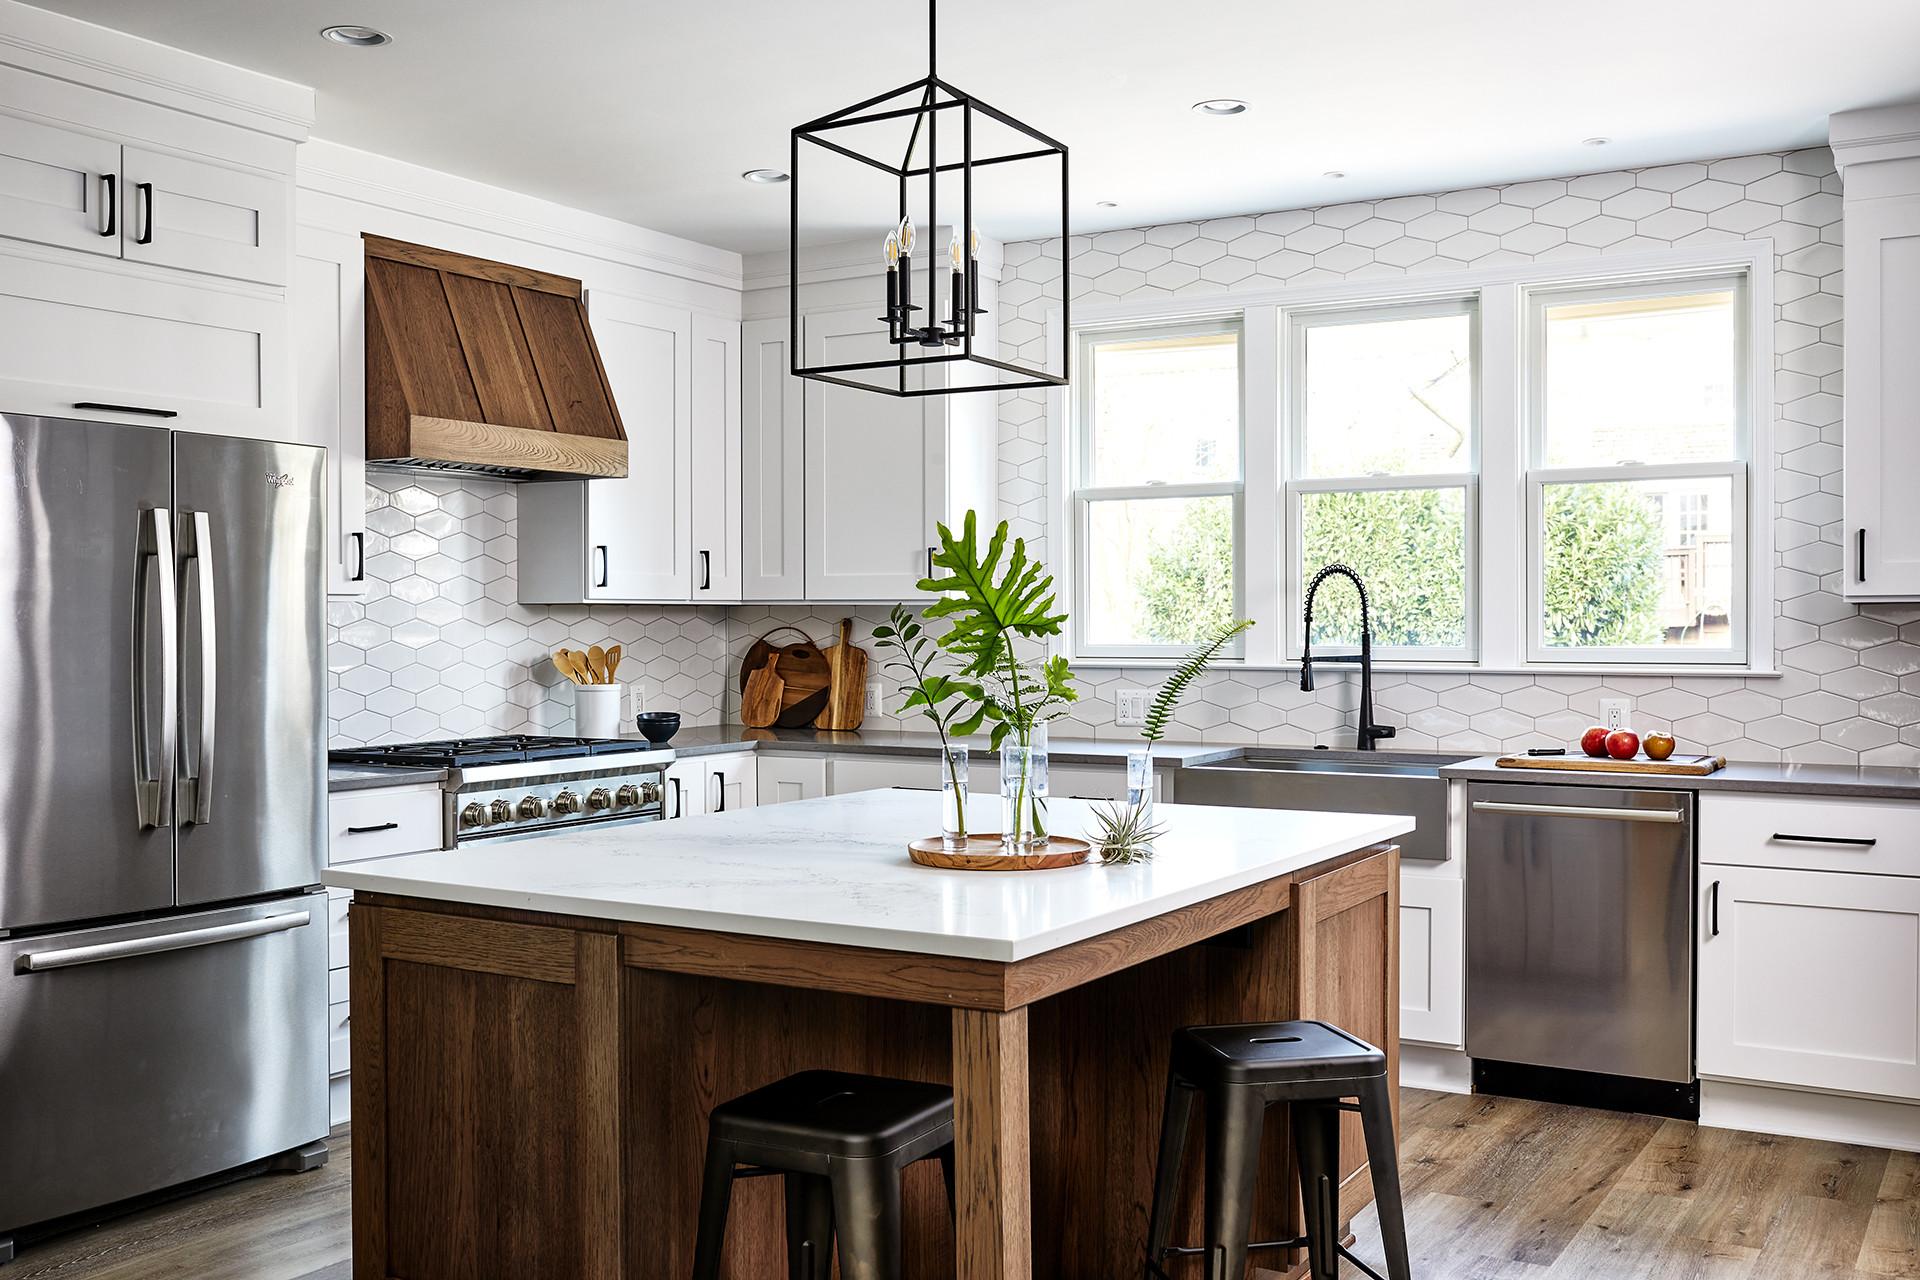 Kitchen Remodel Gaithersburg Md Transitional Kitchen Dc Metro By Case Design Remodeling Inc Houzz